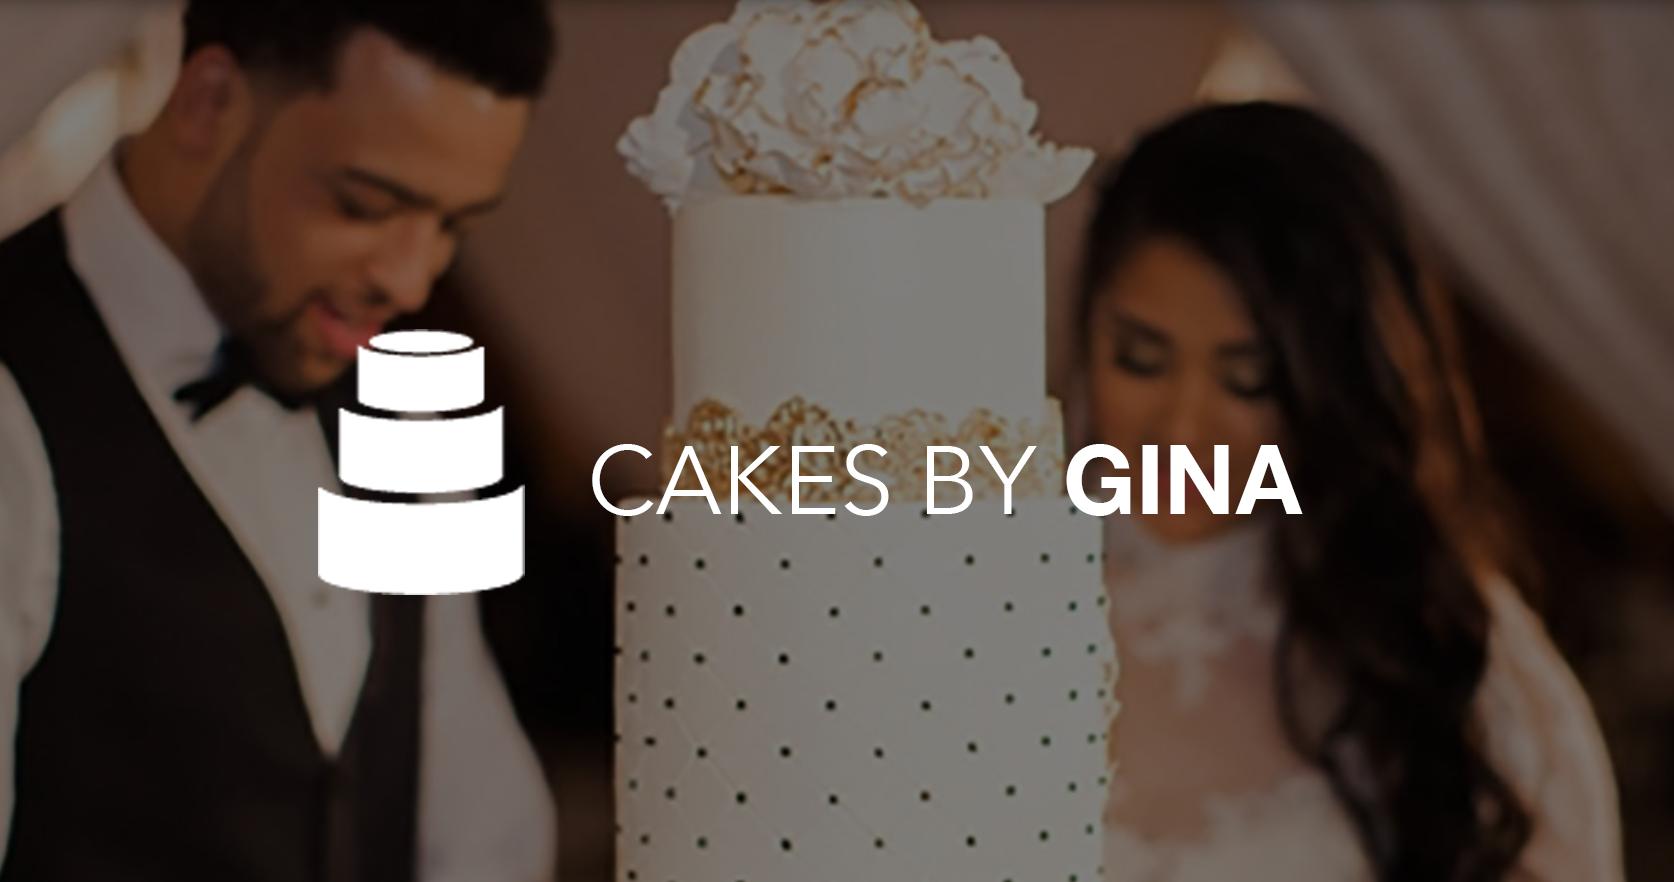 CAKES. Cakes by Gina - WEBSITE: cakesbygina.comPHONE: (281) 495-9400